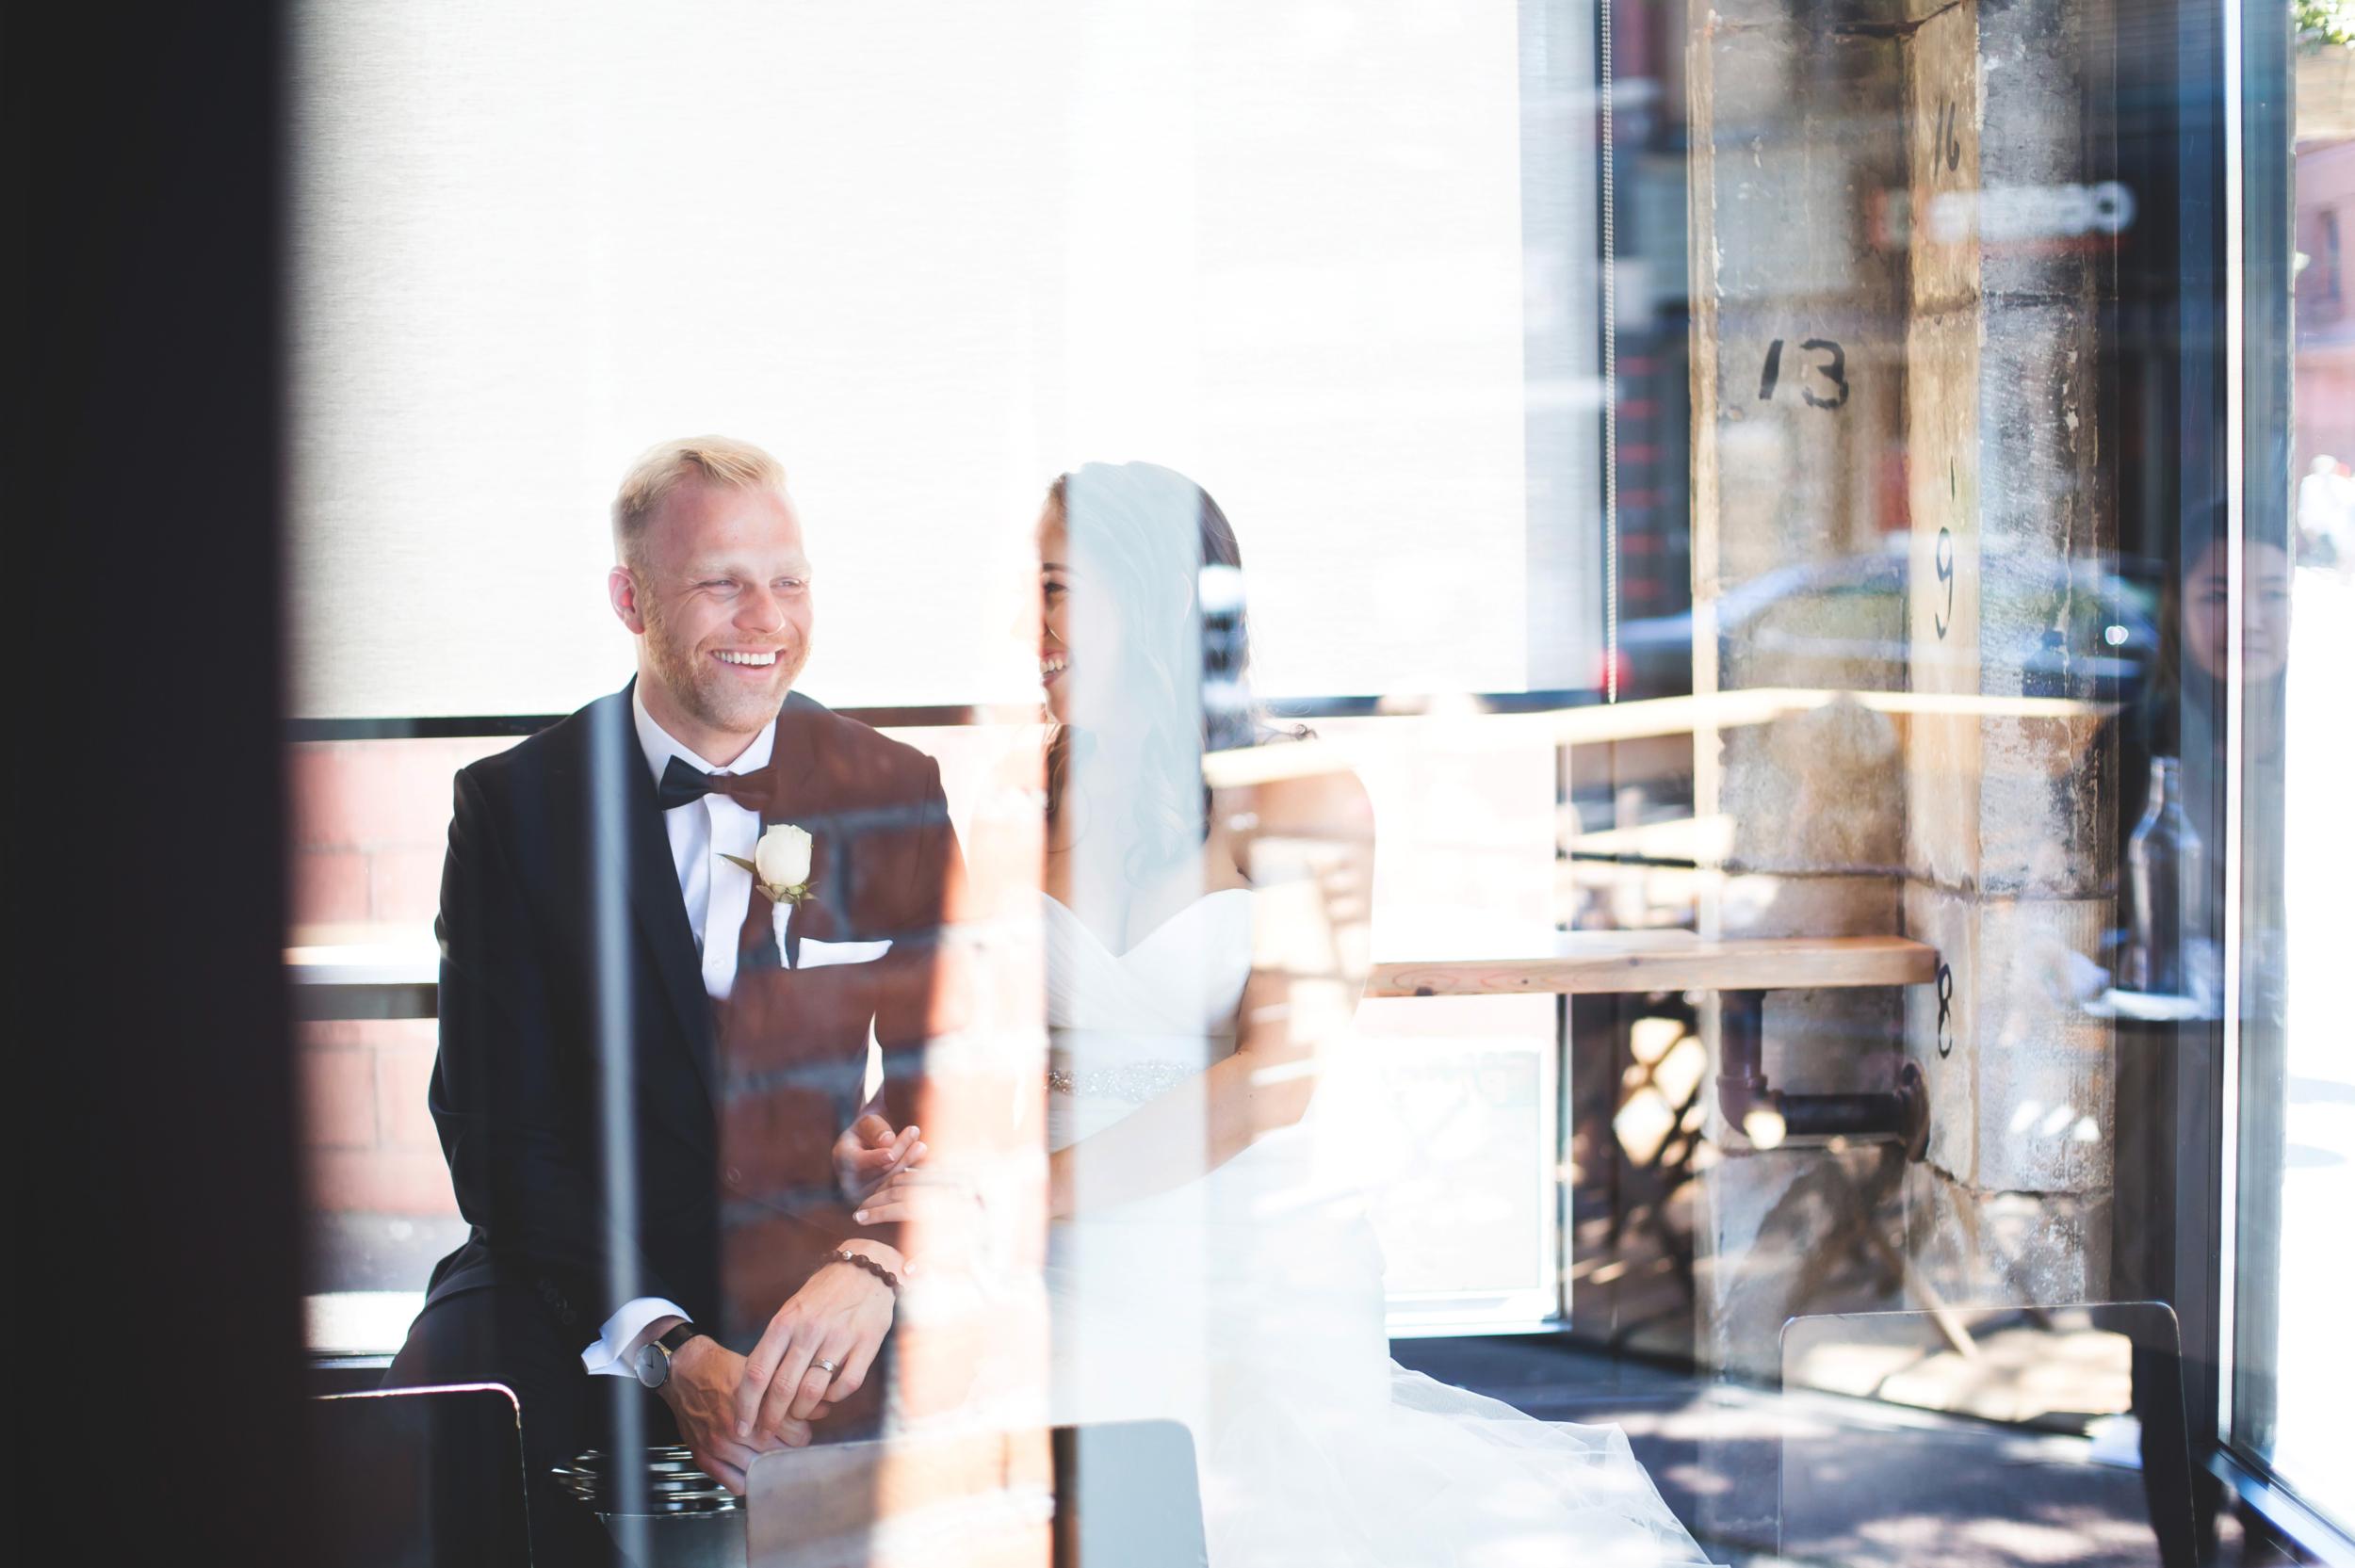 Wedding-Harbour-Banquet-Center-Oakville-Photographer-Wedding-Hamilton-Saint-James-Espresso-Downtown-HamOnt-GTA-Niagara-Toronto-Moments-by-Lauren-Photography-Photo-Image-26.png